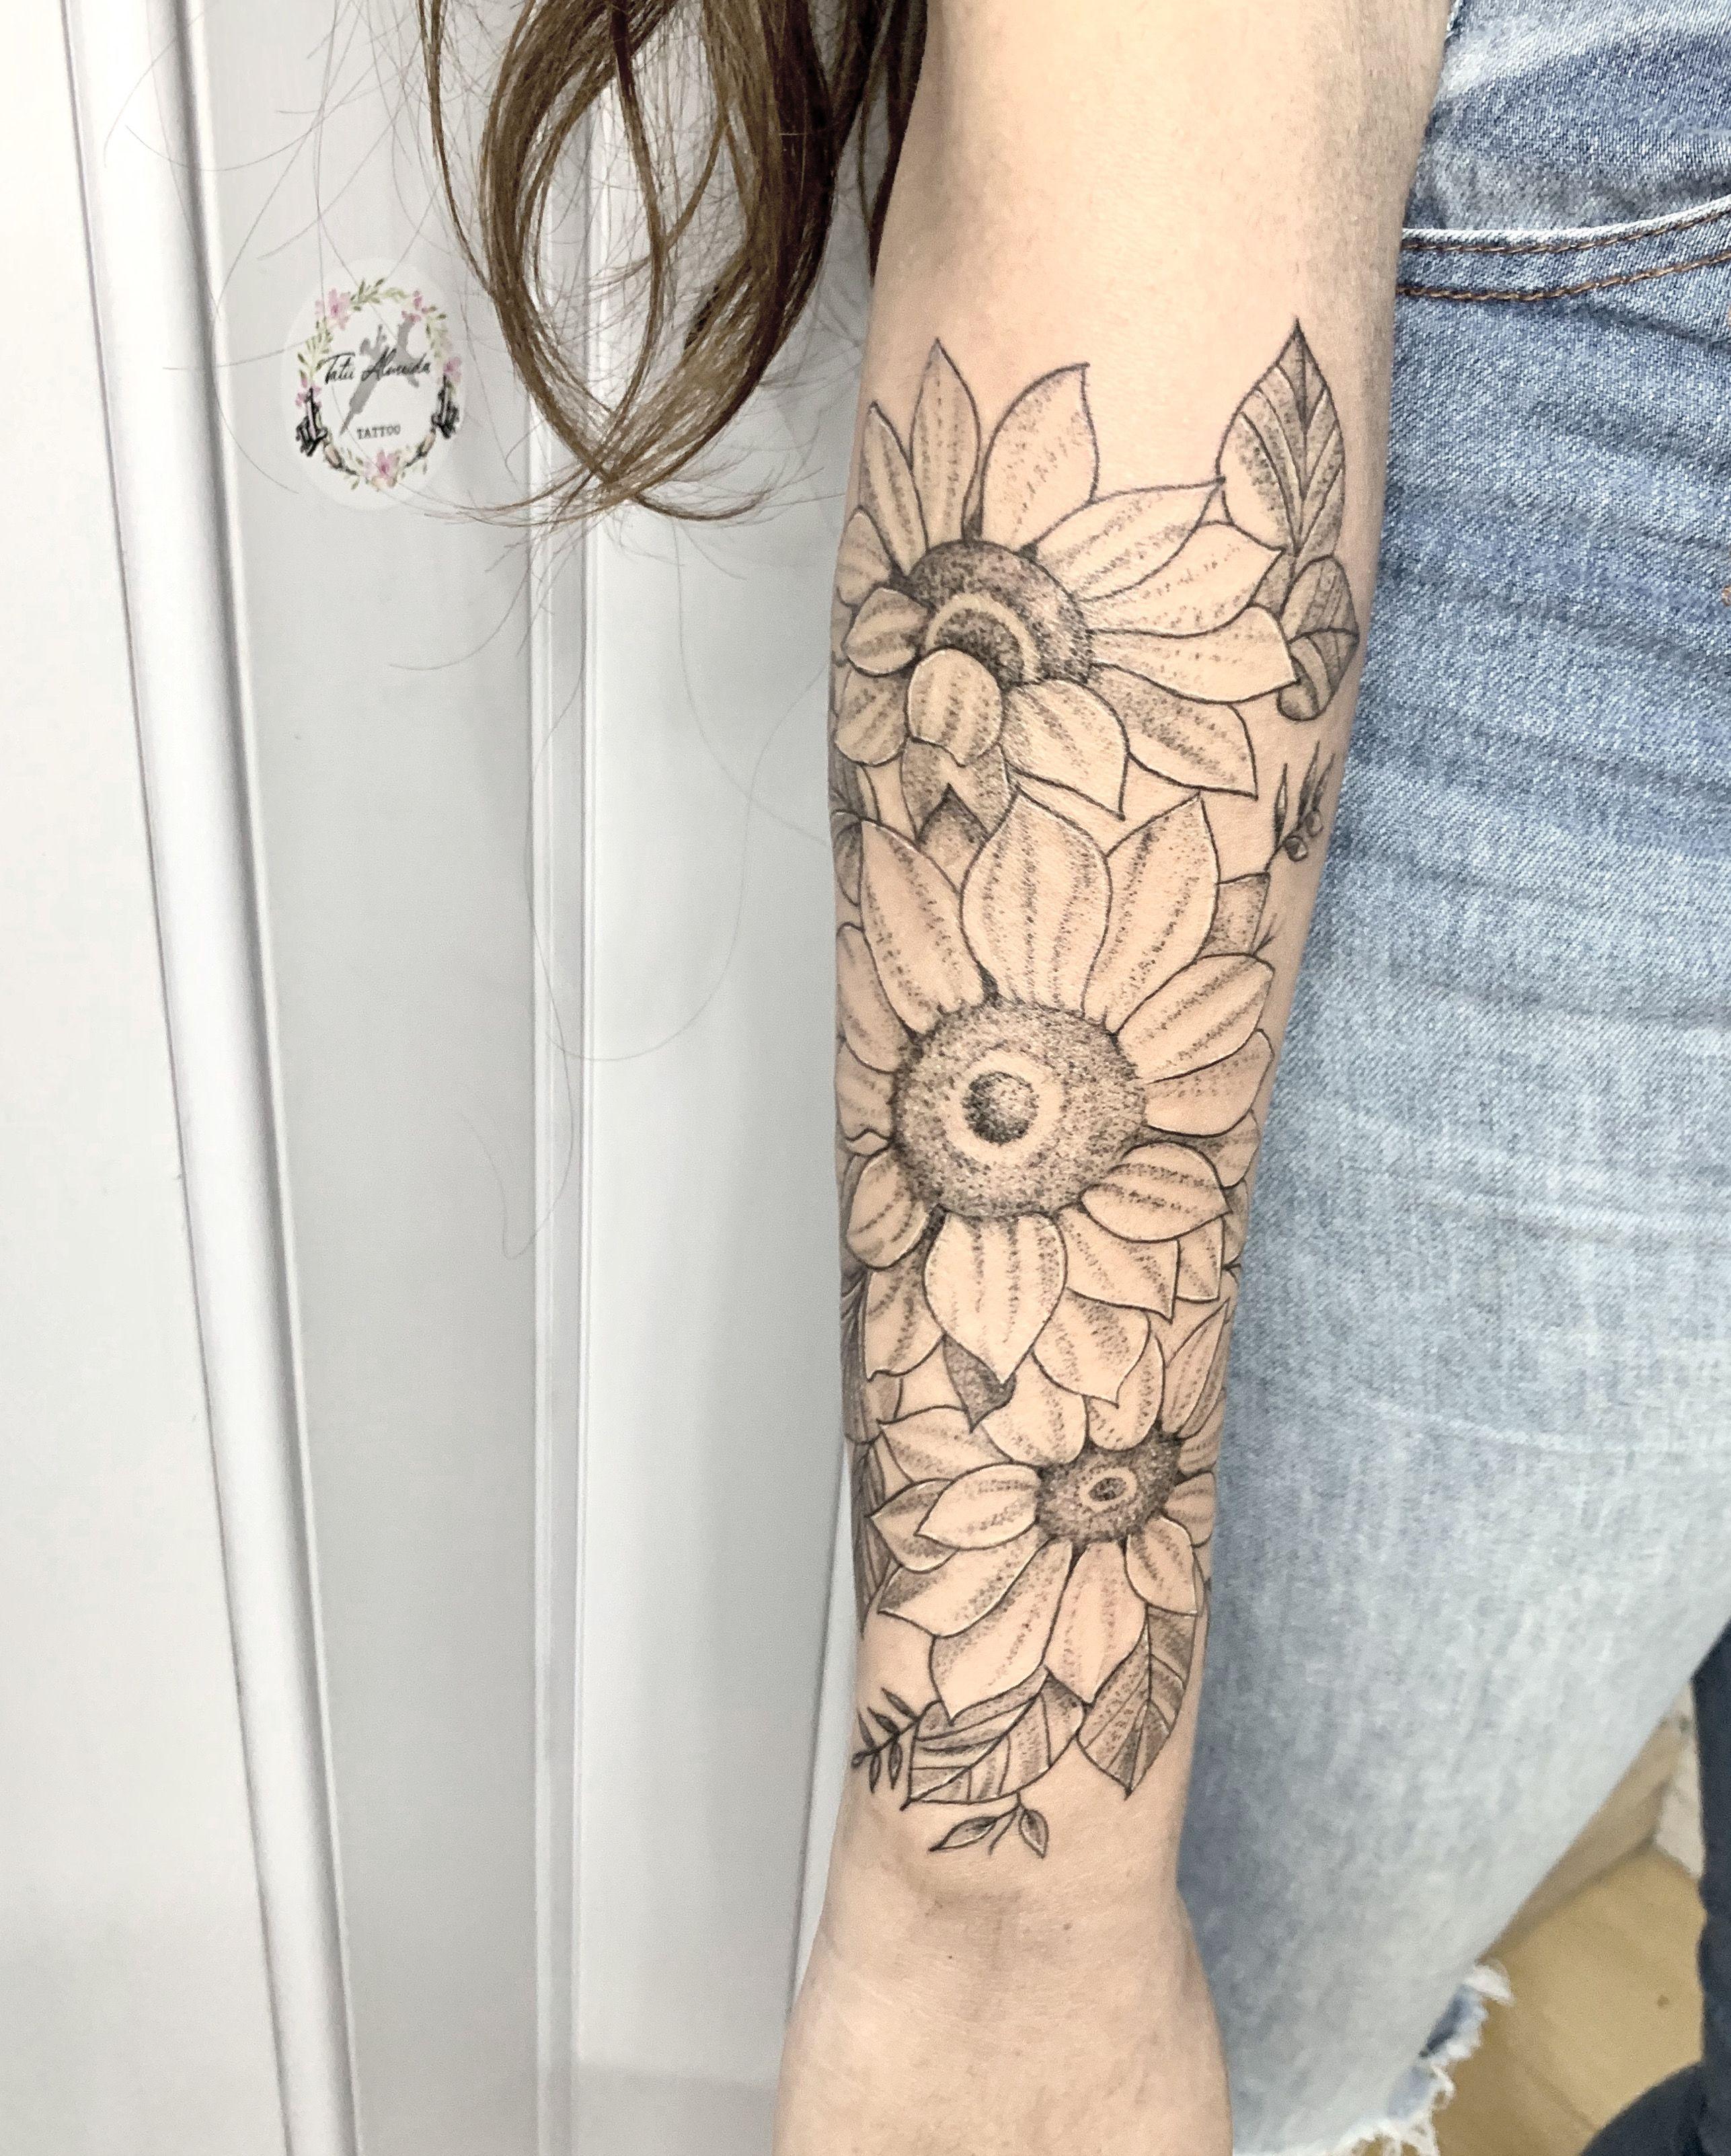 Tatuajes Tatii Almeida Tattoo Tatii Almeida Tattoo Instagram Photos And Videos Tatuajes Girasoles Tatuajes Tatuaje Flores Antebrazo